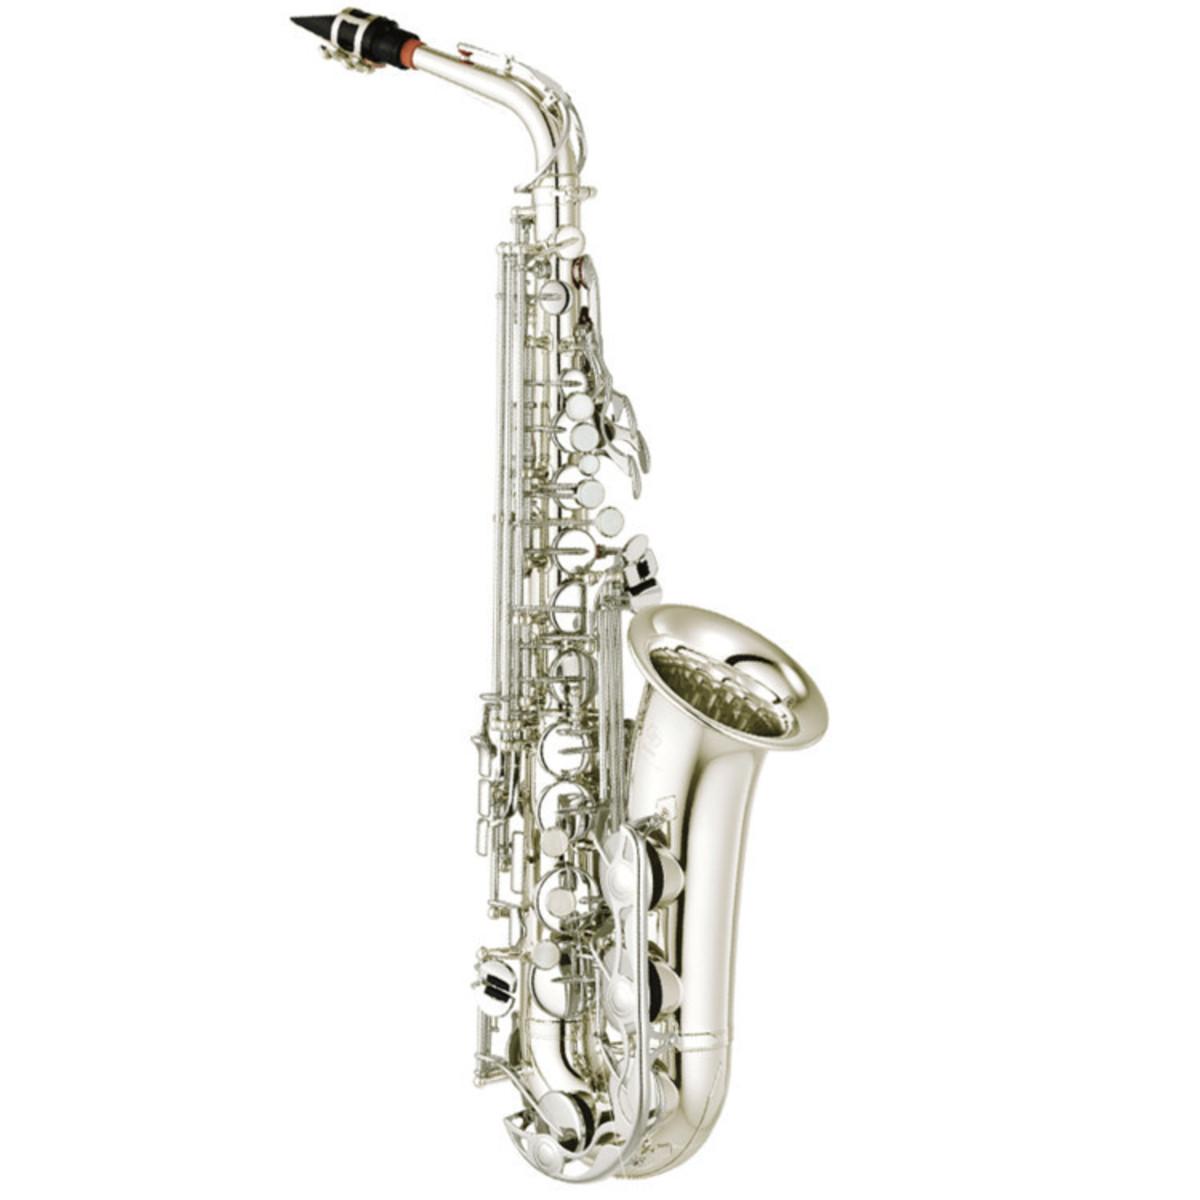 Yamaha yas280 student alto saxophone silver ex demo at for Yamaha student saxophone